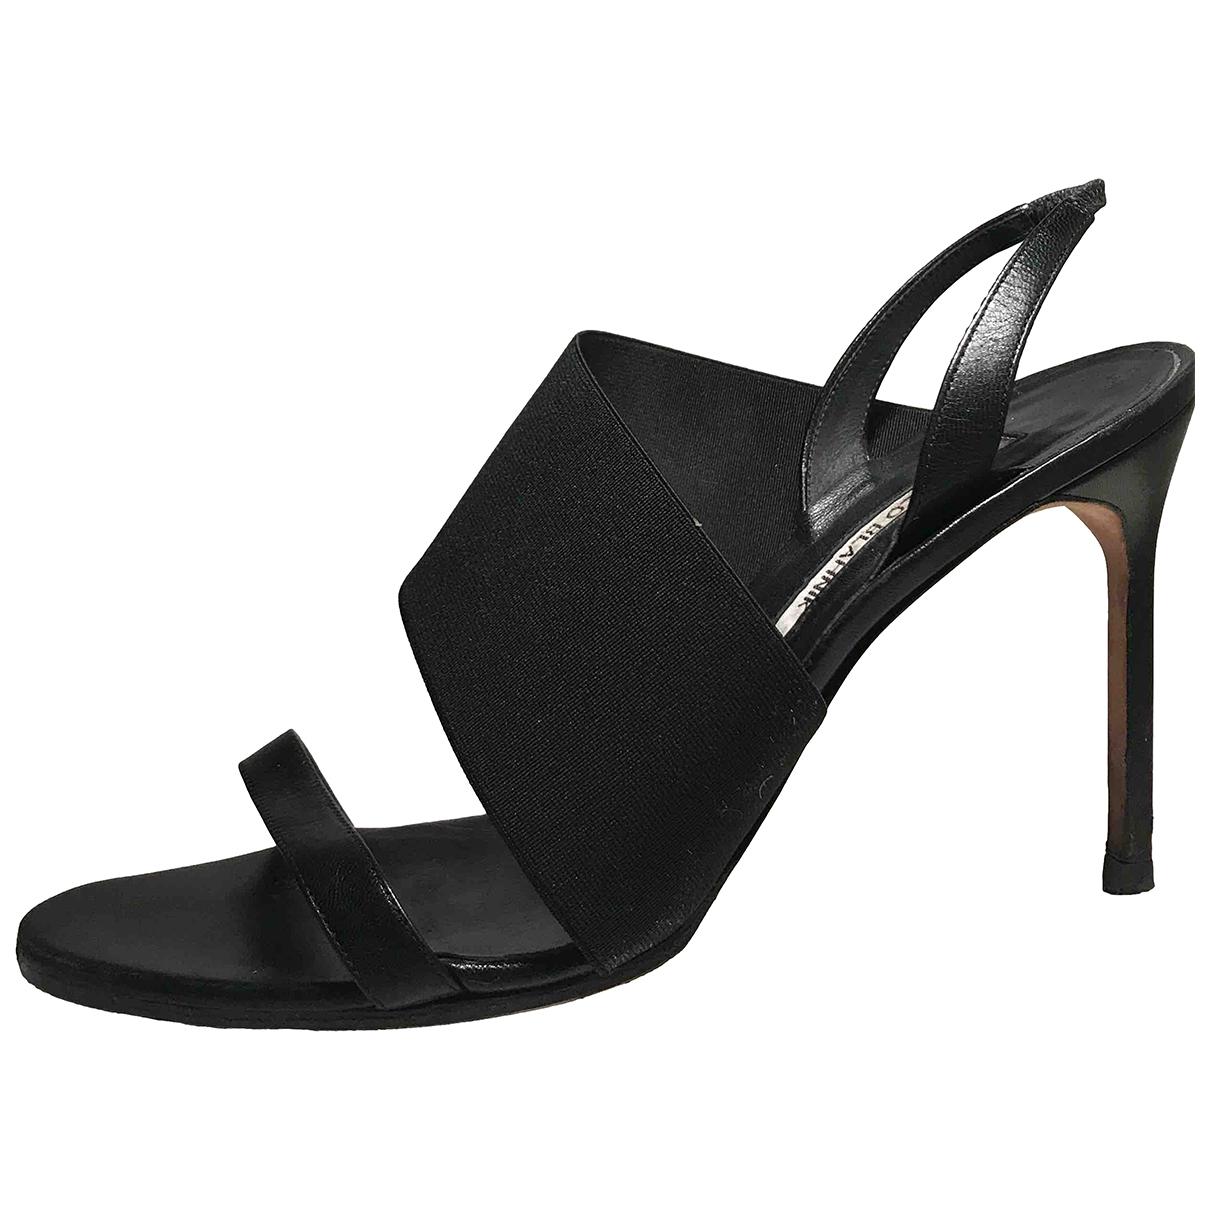 Manolo Blahnik \N Black Cloth Sandals for Women 40.5 EU